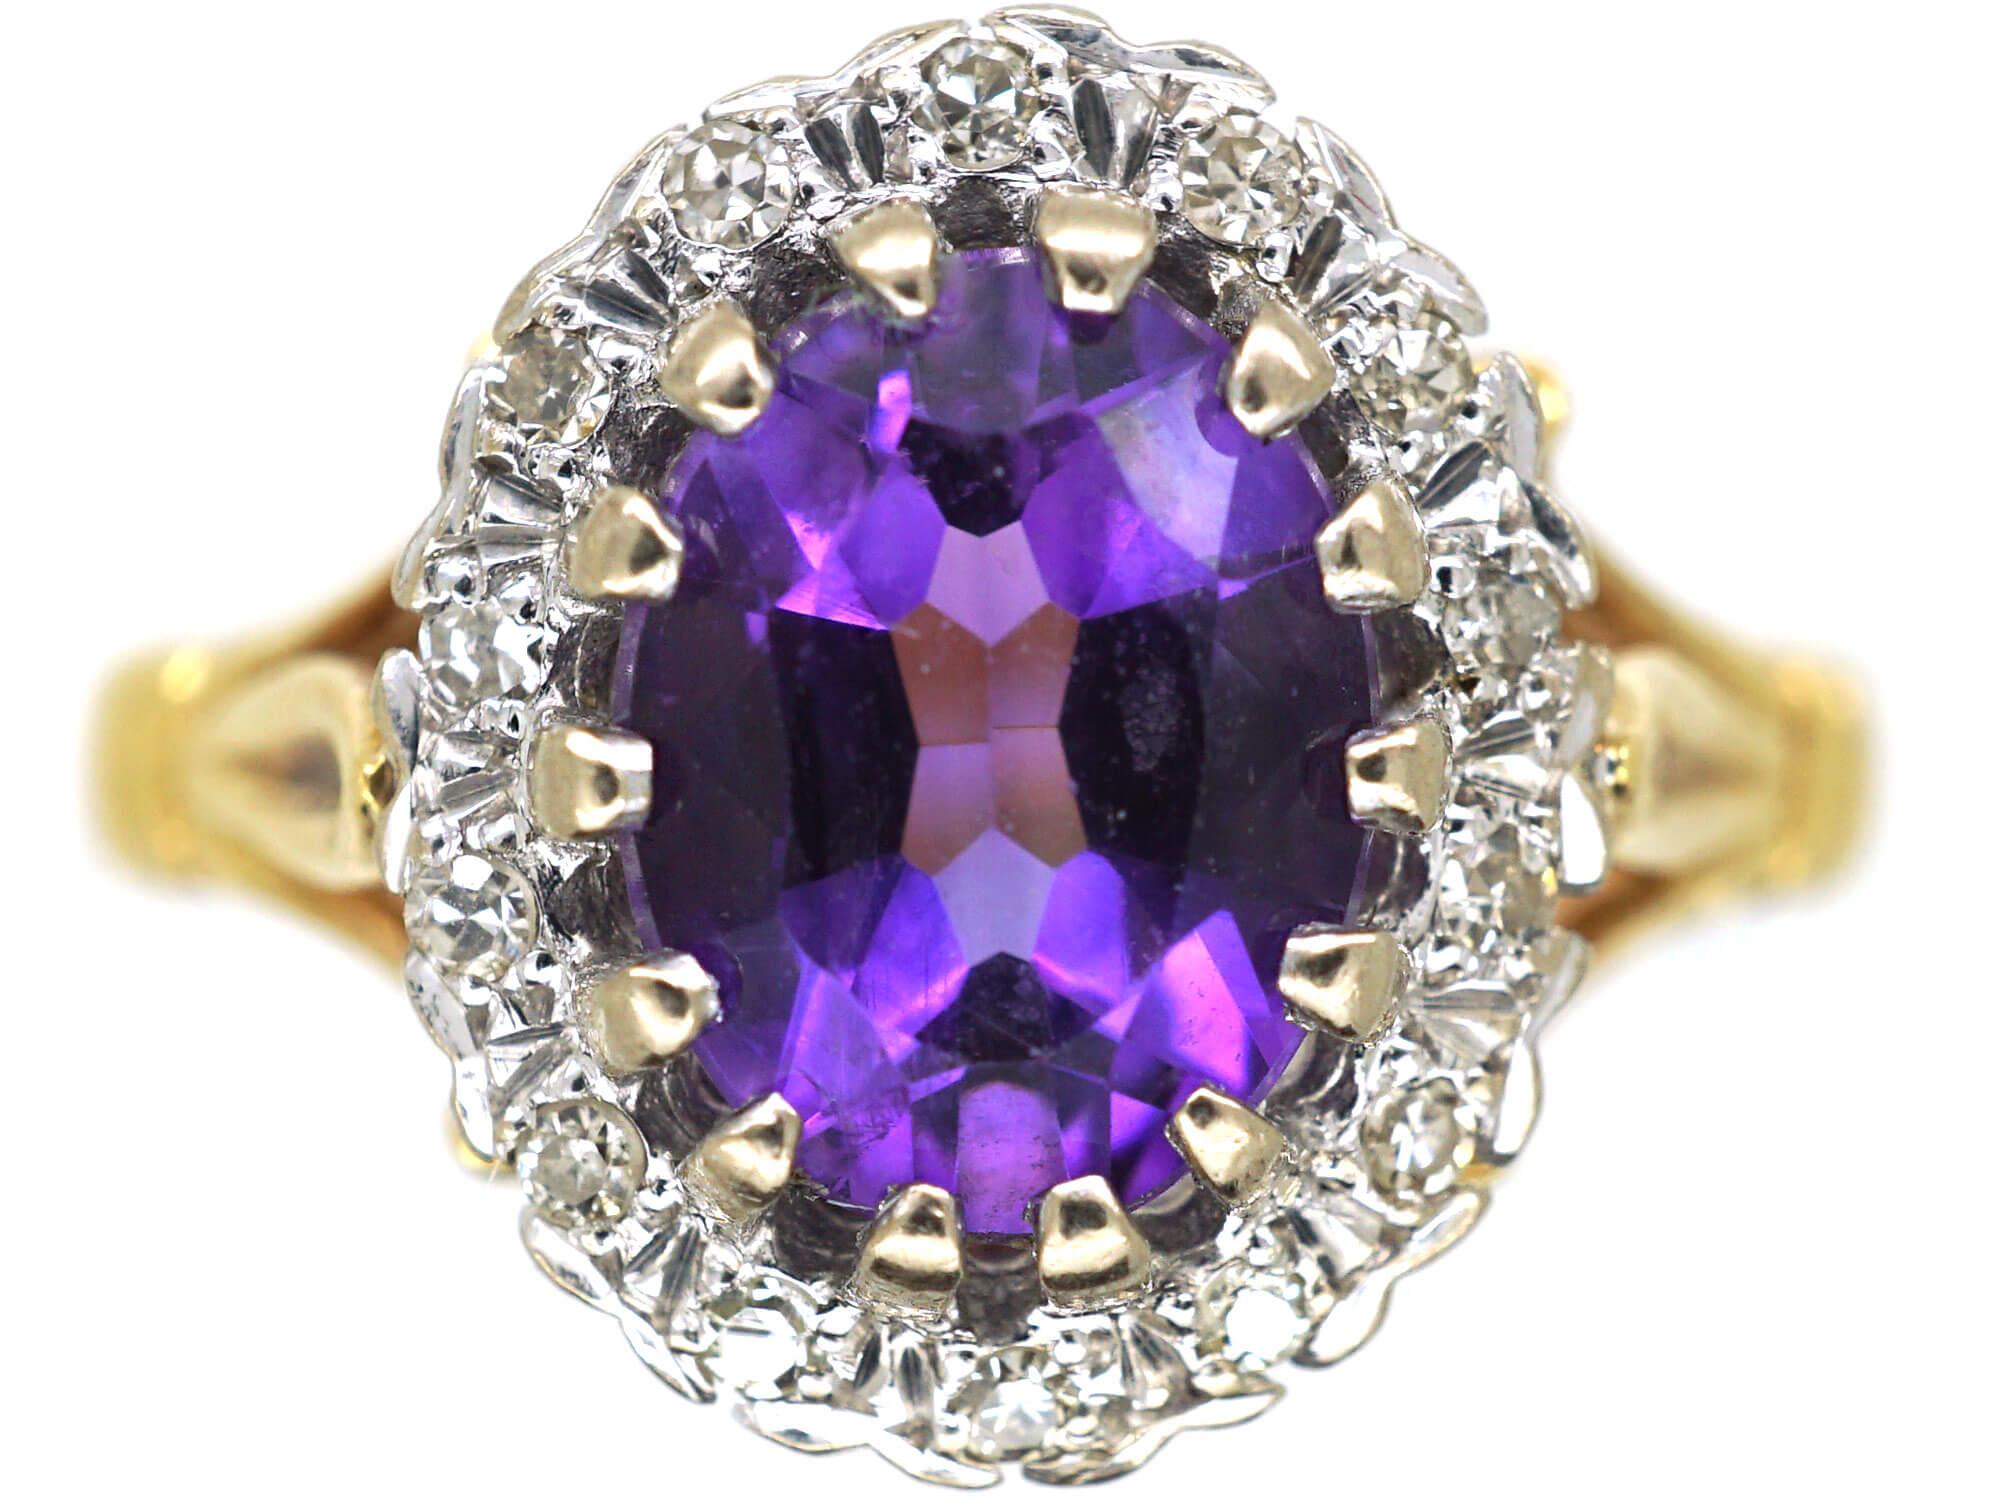 18ct Gold, Amethyst & Diamond Cluster Ring